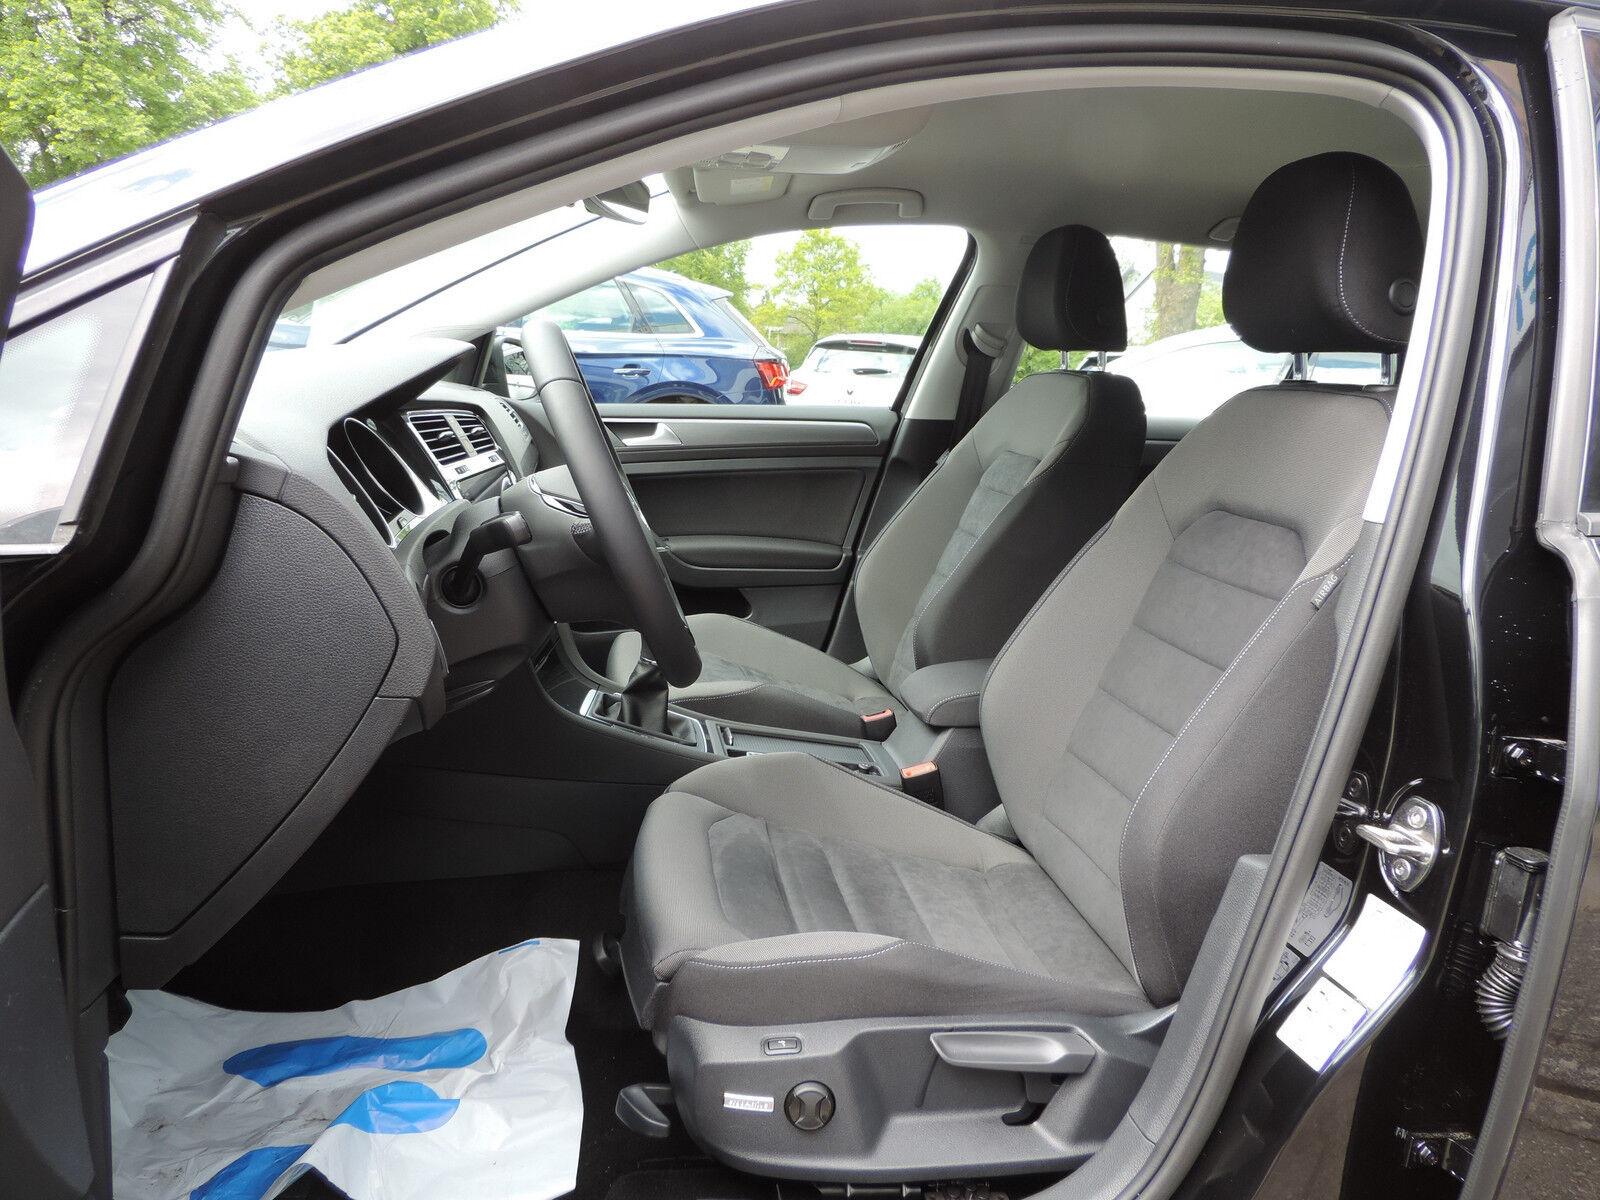 Volkswagen Golf 1.6 TDI R-LINE CLIMA REGUL ACC GPS LED NEUVE 6/15